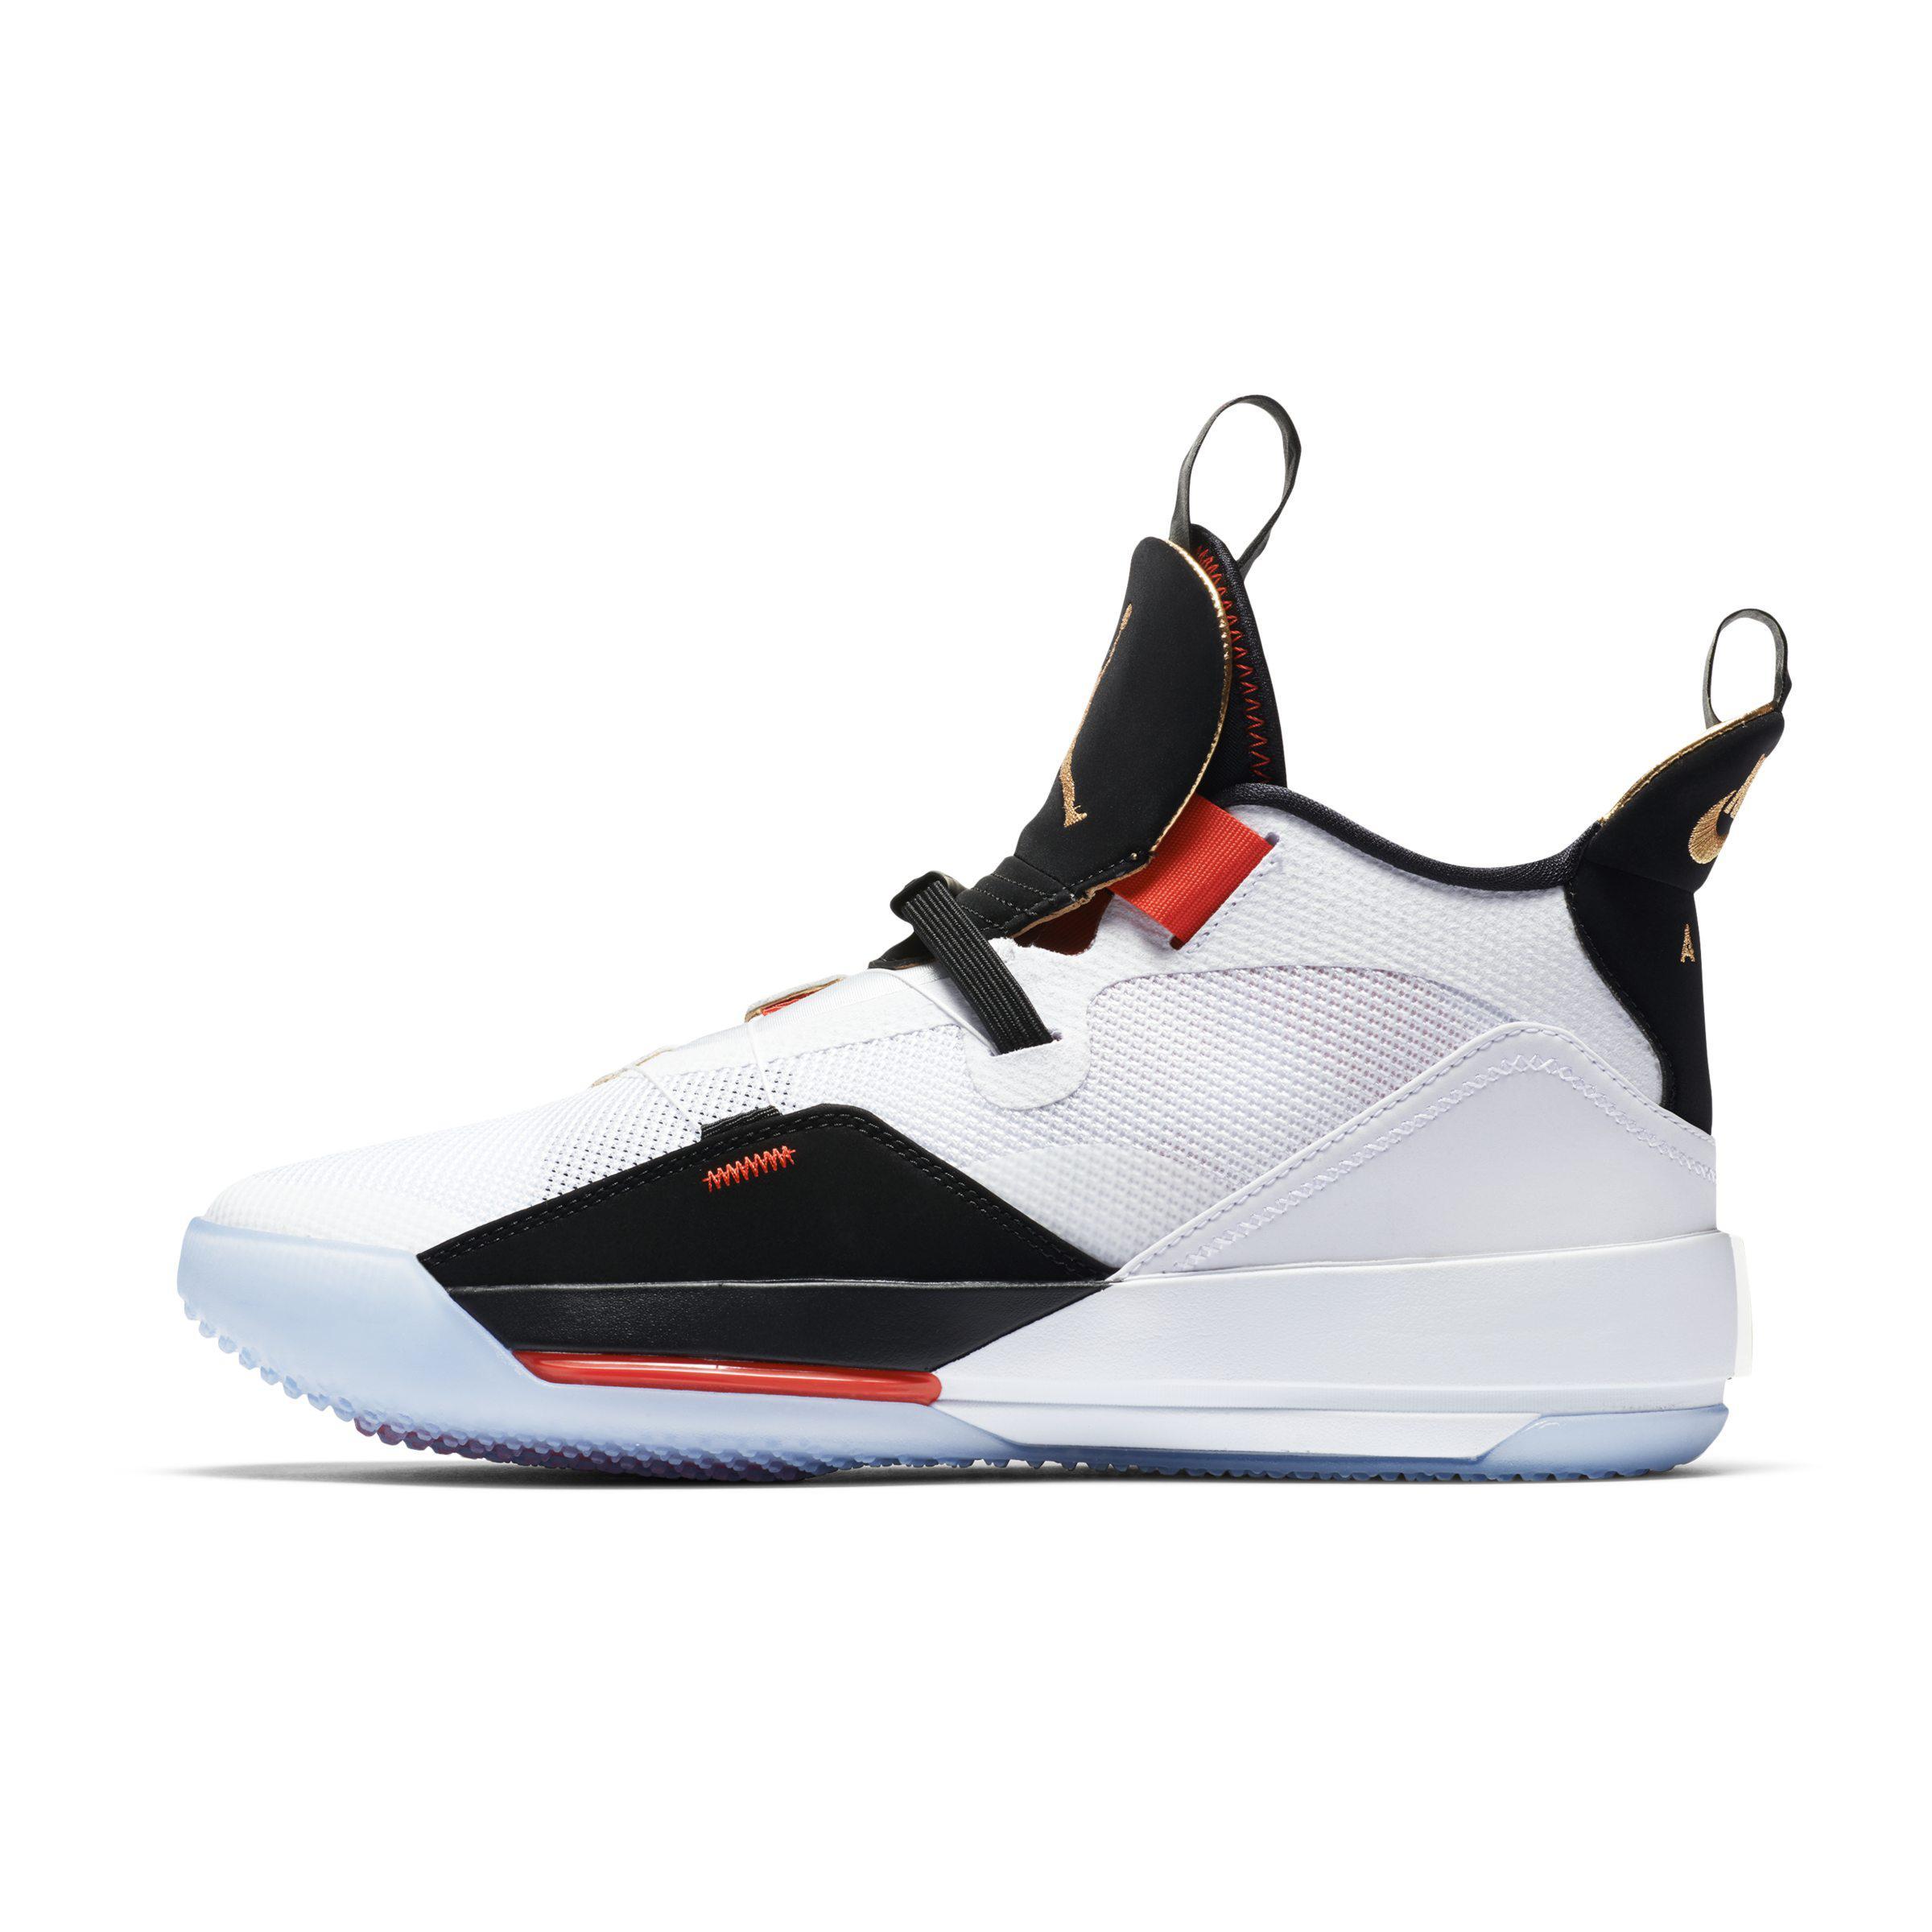 6c045495c7a Nike Air Jordan Xxxiii Basketball Shoe for Men - Lyst